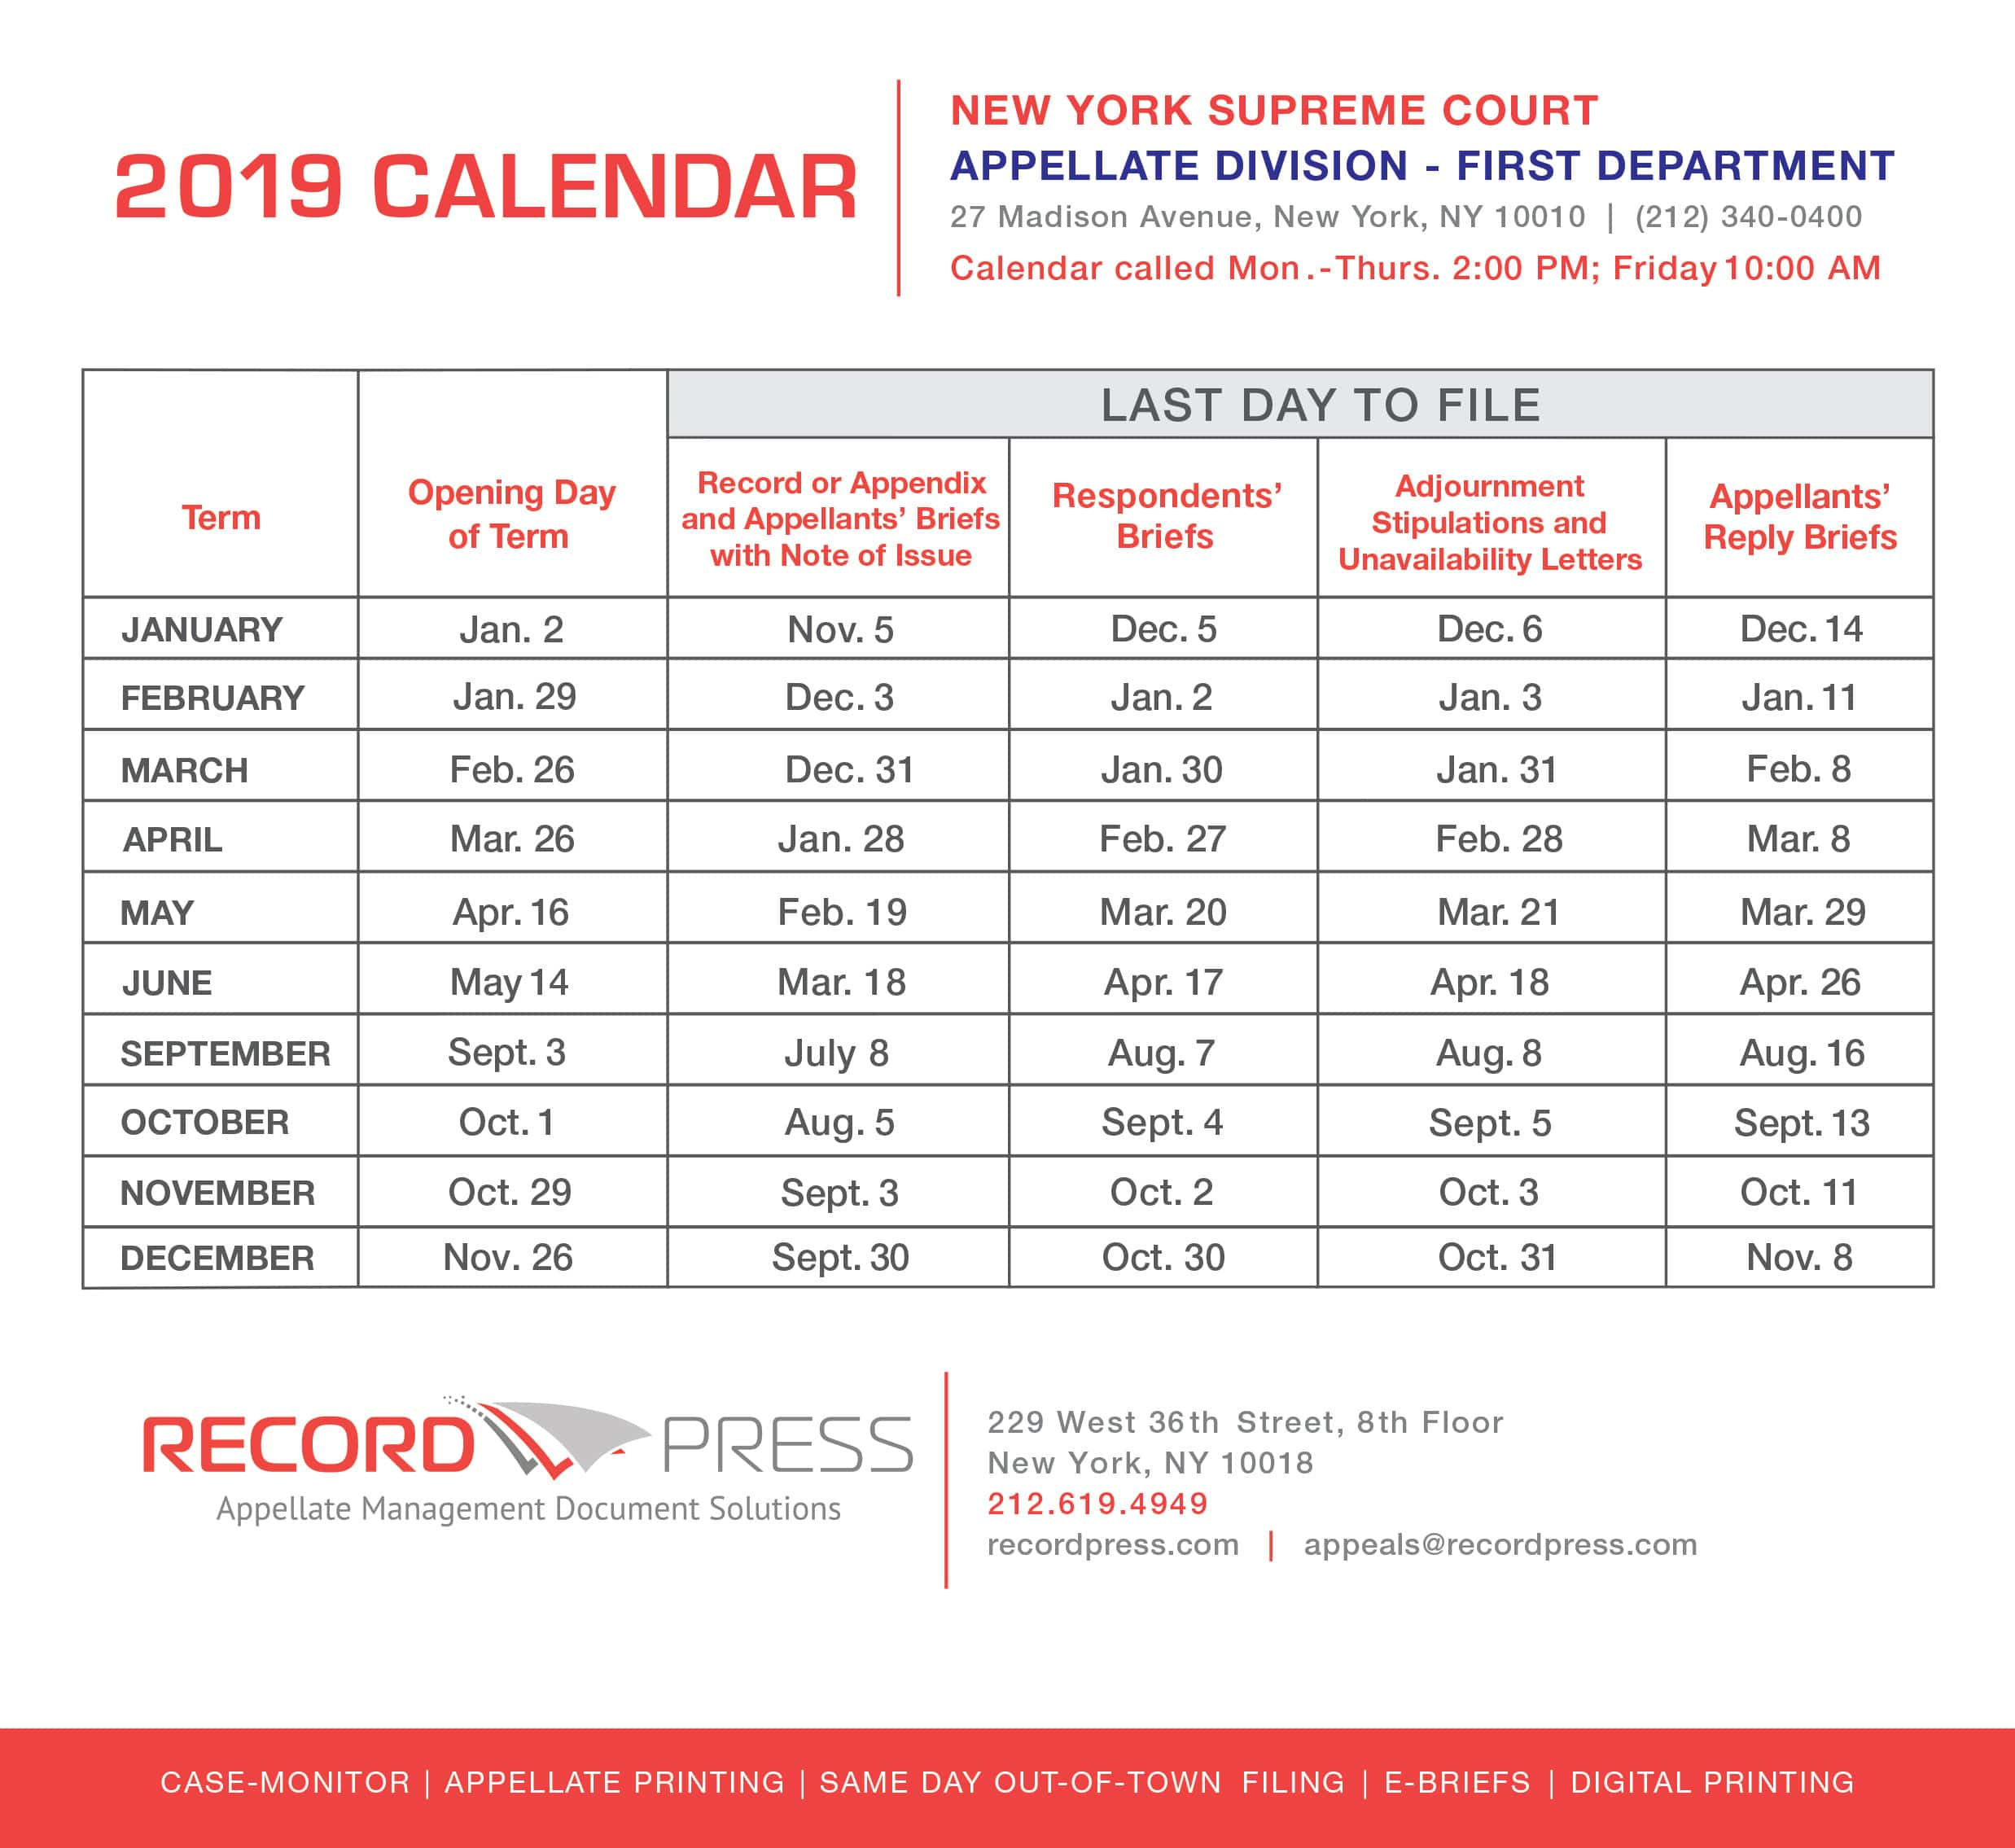 2019 AD1 Calendar